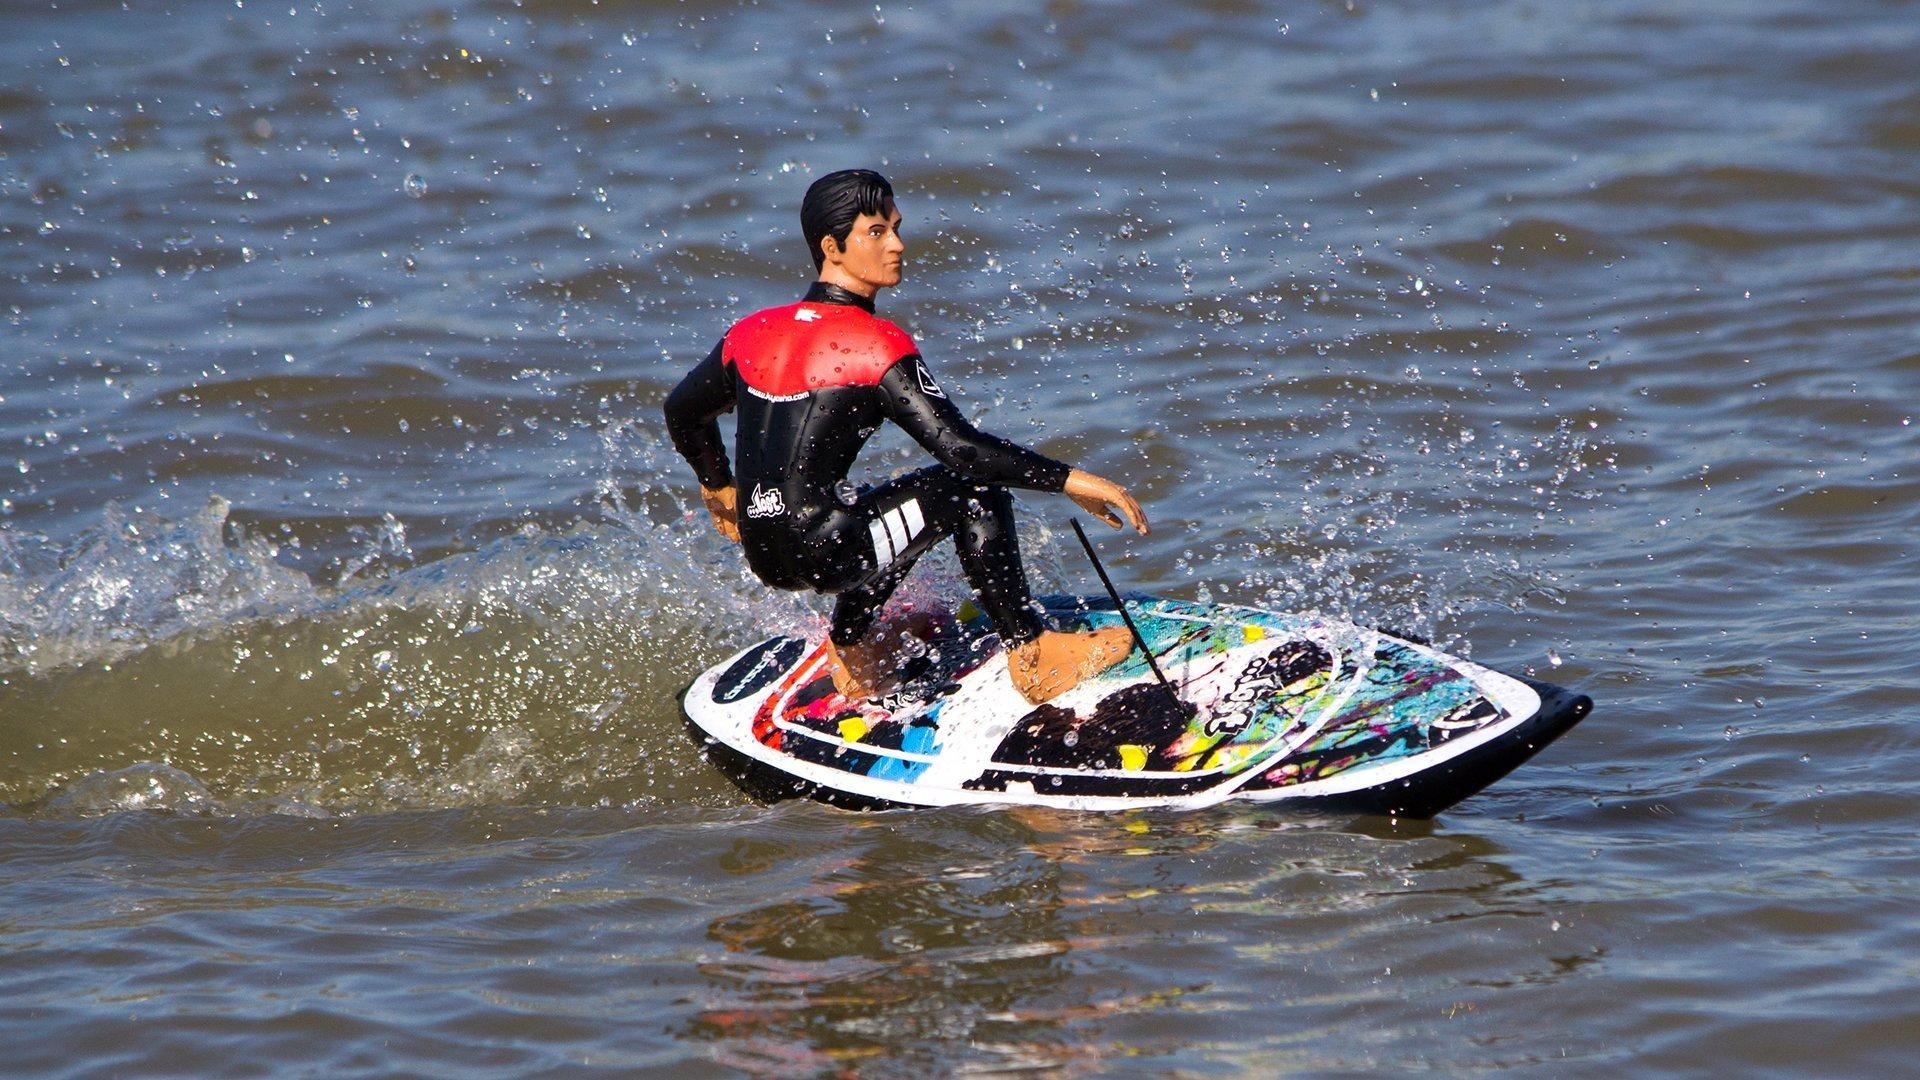 Surfer kyosho